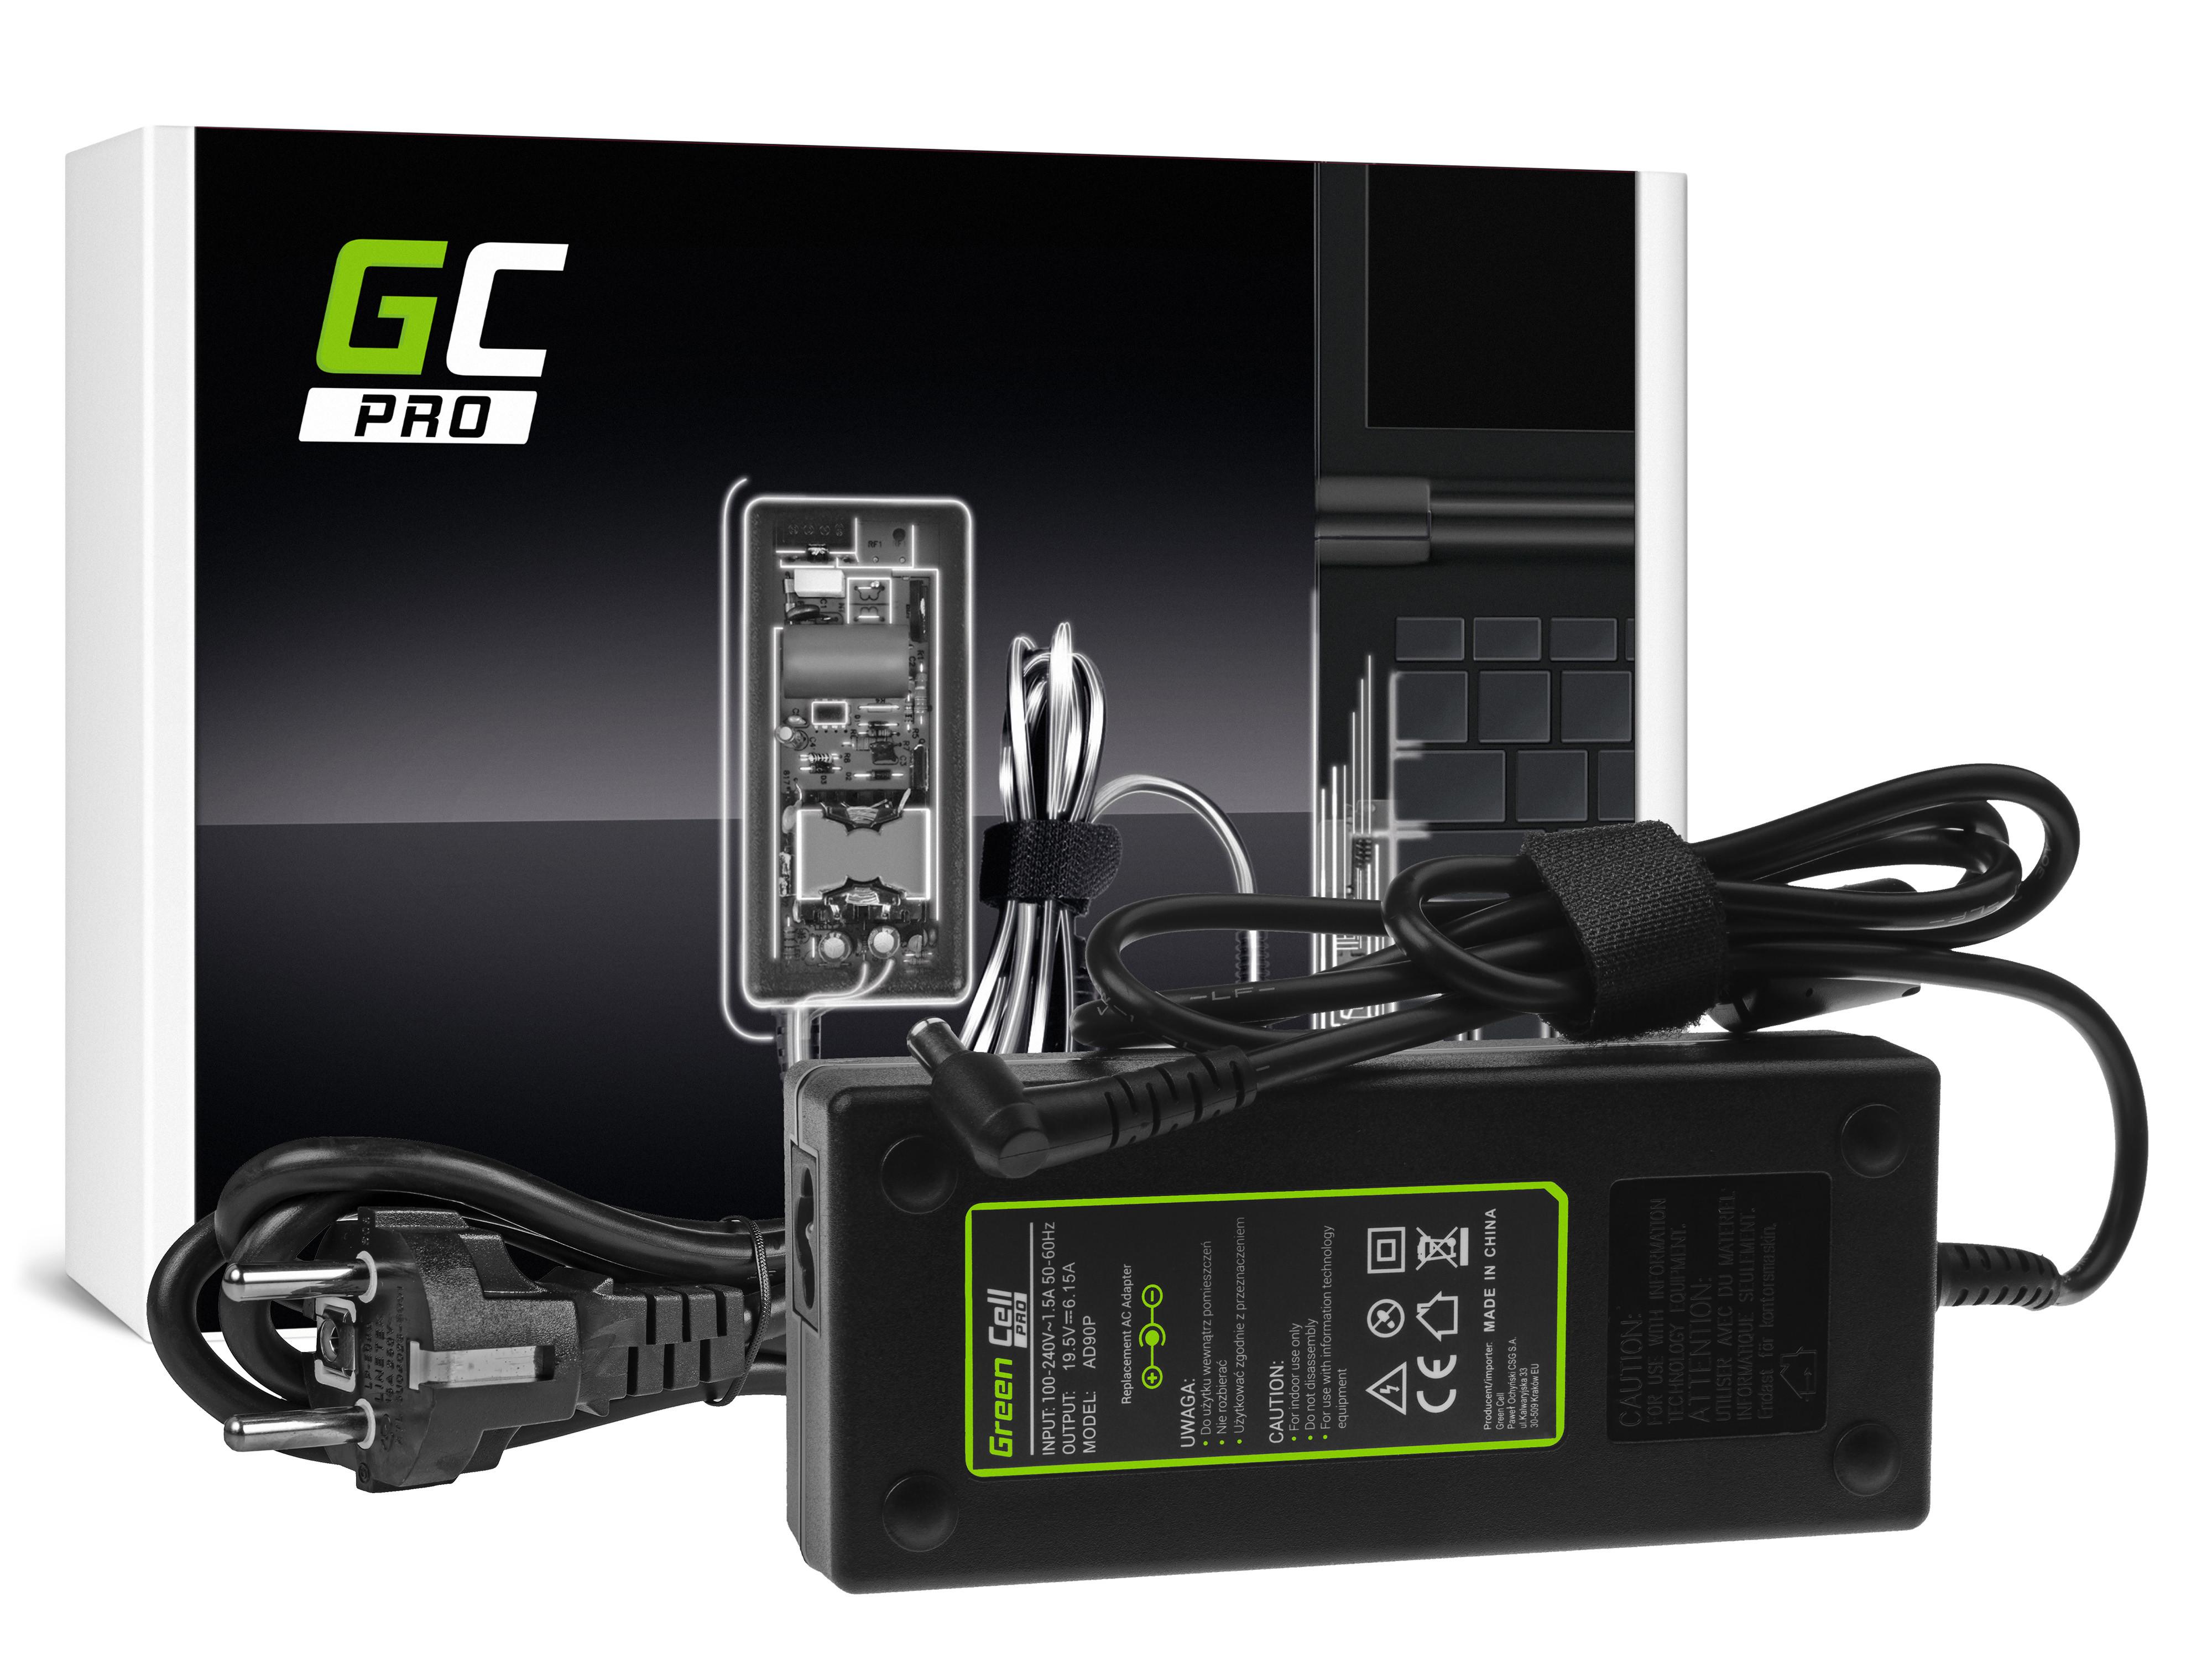 Green Cell AD90P Adaptér Nabíječka Sony Vaio PCG-81112M VGN-AR61S VGN-AR71S VGN-AW31S VPCF11S1E 19.5V 6.15A 120W